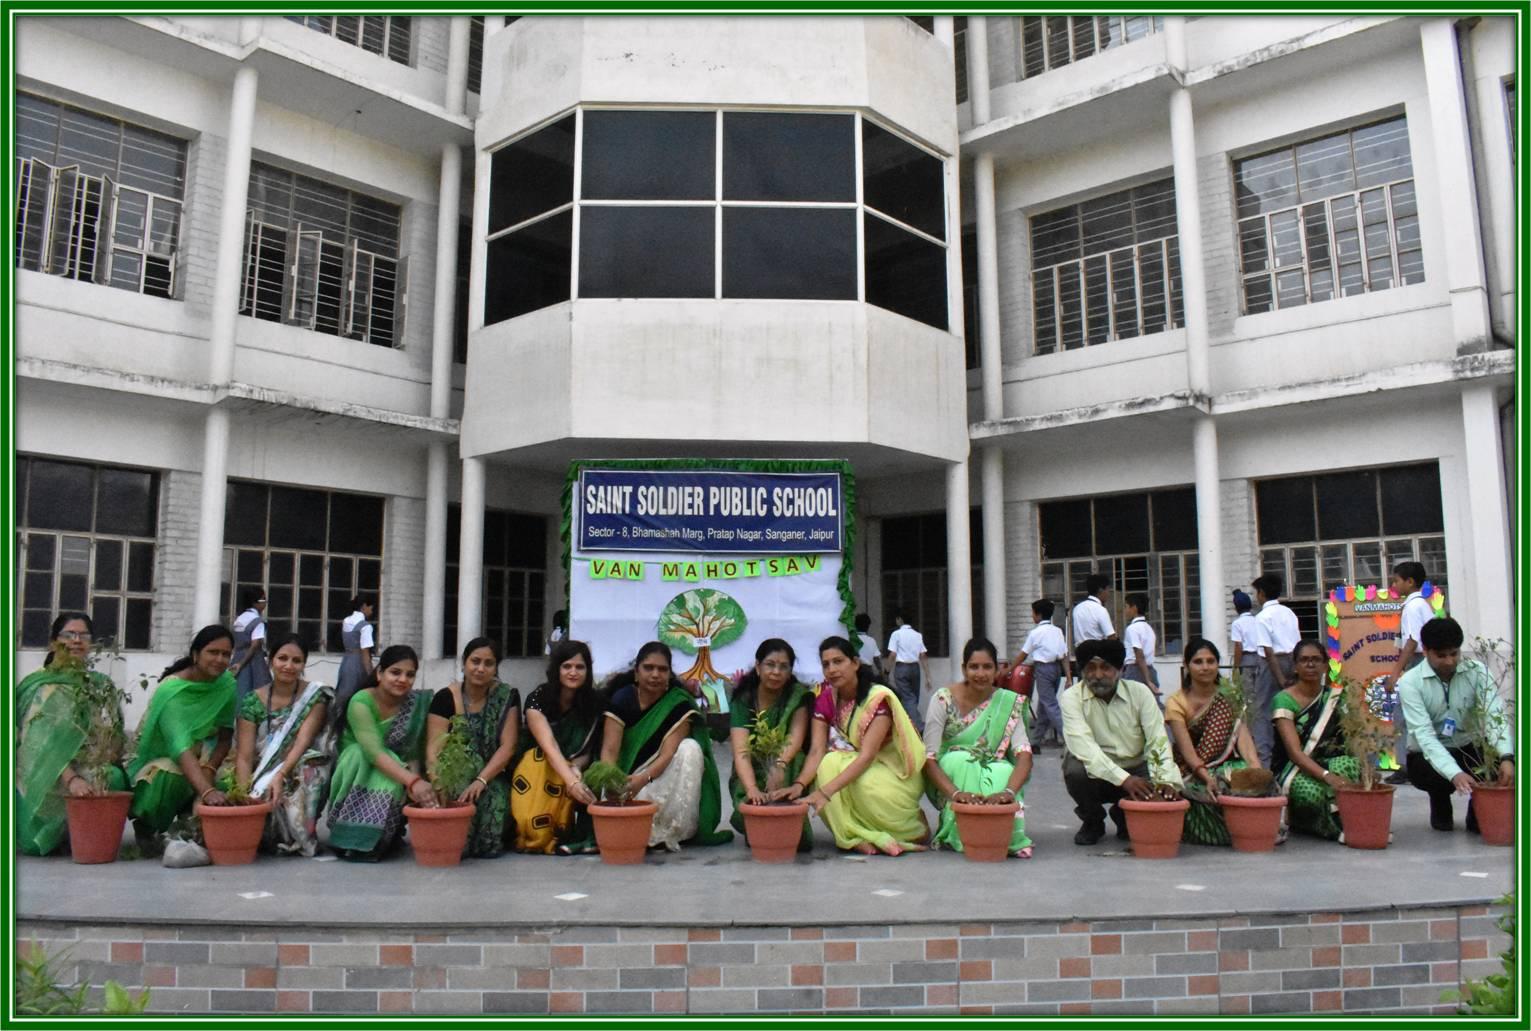 Saint Soldier Public School Pratap Nagar Jaipur: Opening